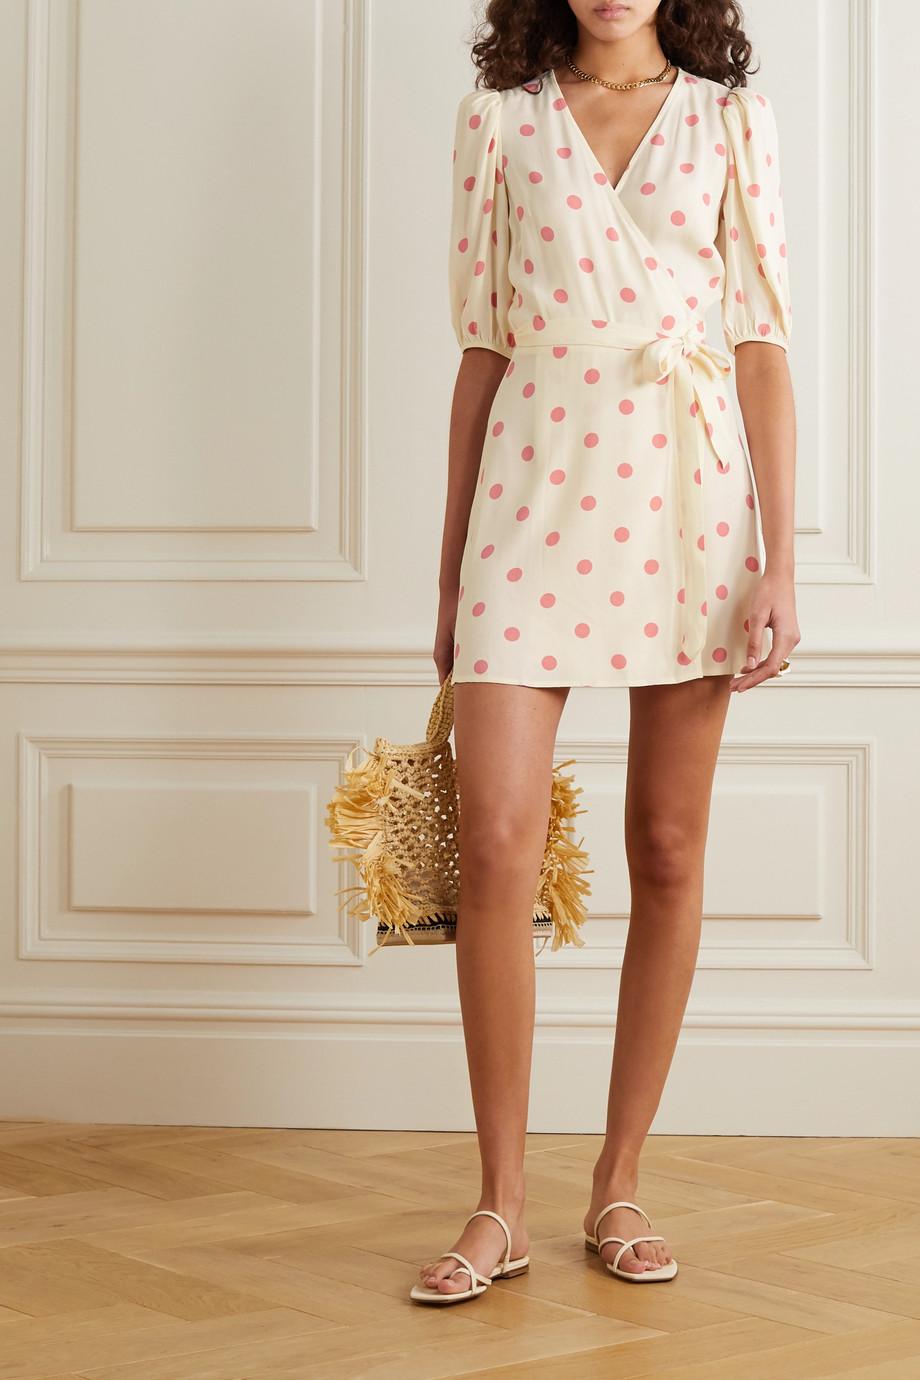 Reformation Olince Mini-Wickelkleid aus Crêpe mit Polka-Dots